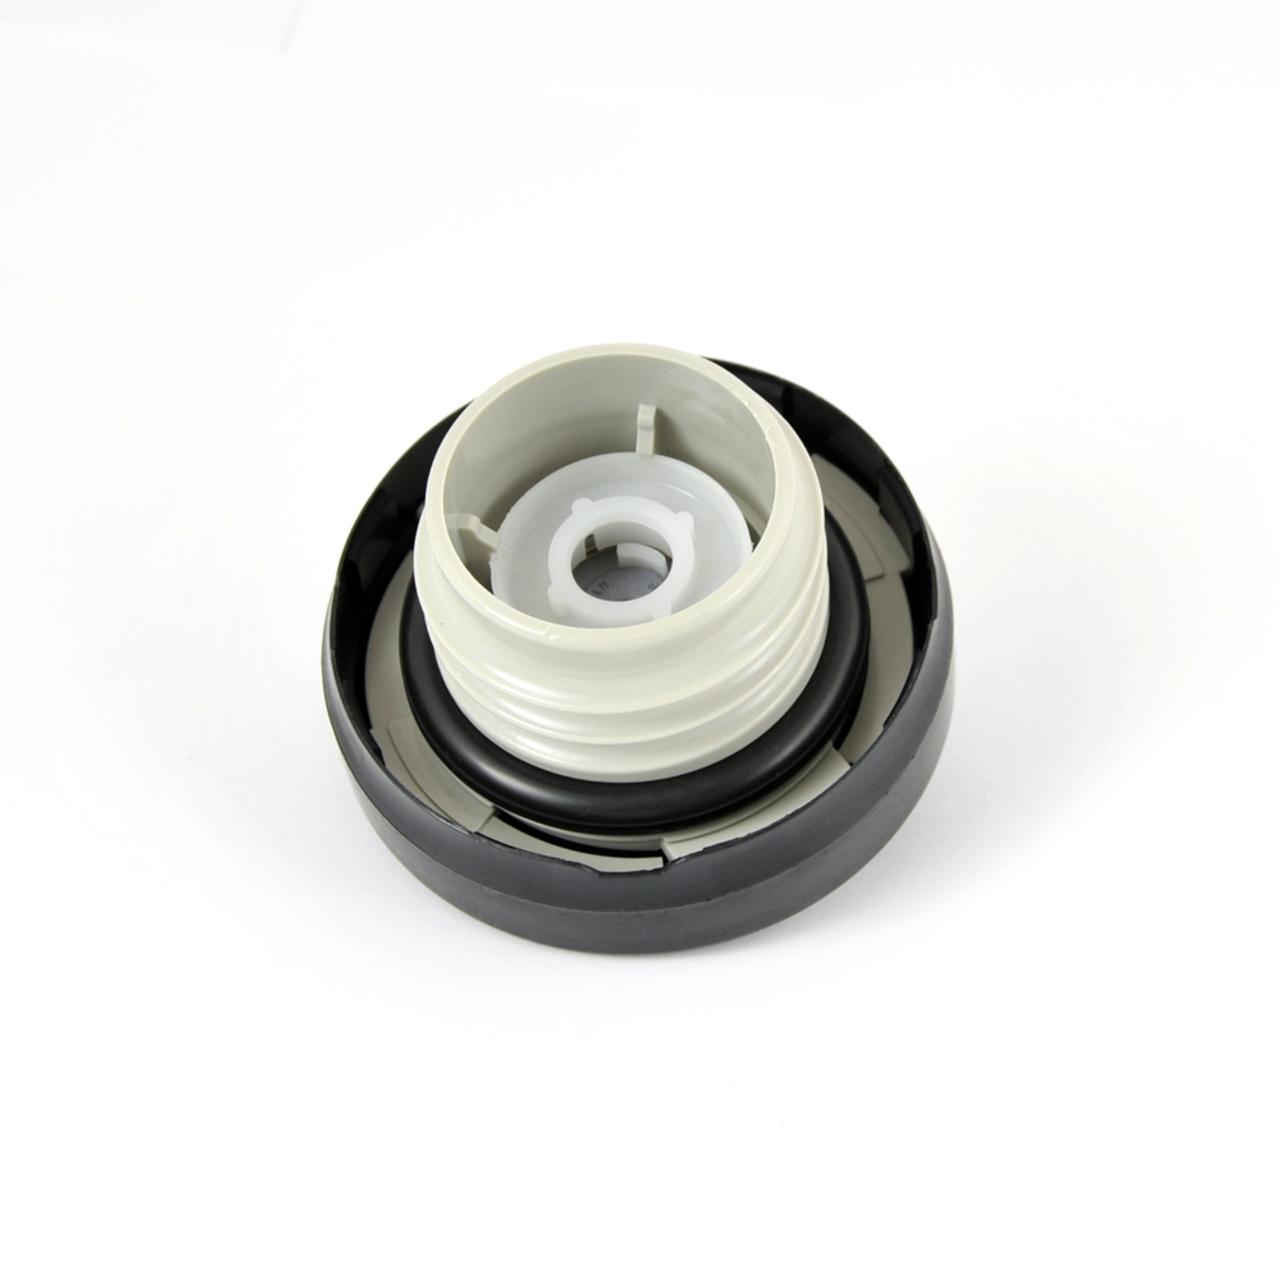 80 Series Fuel Cap